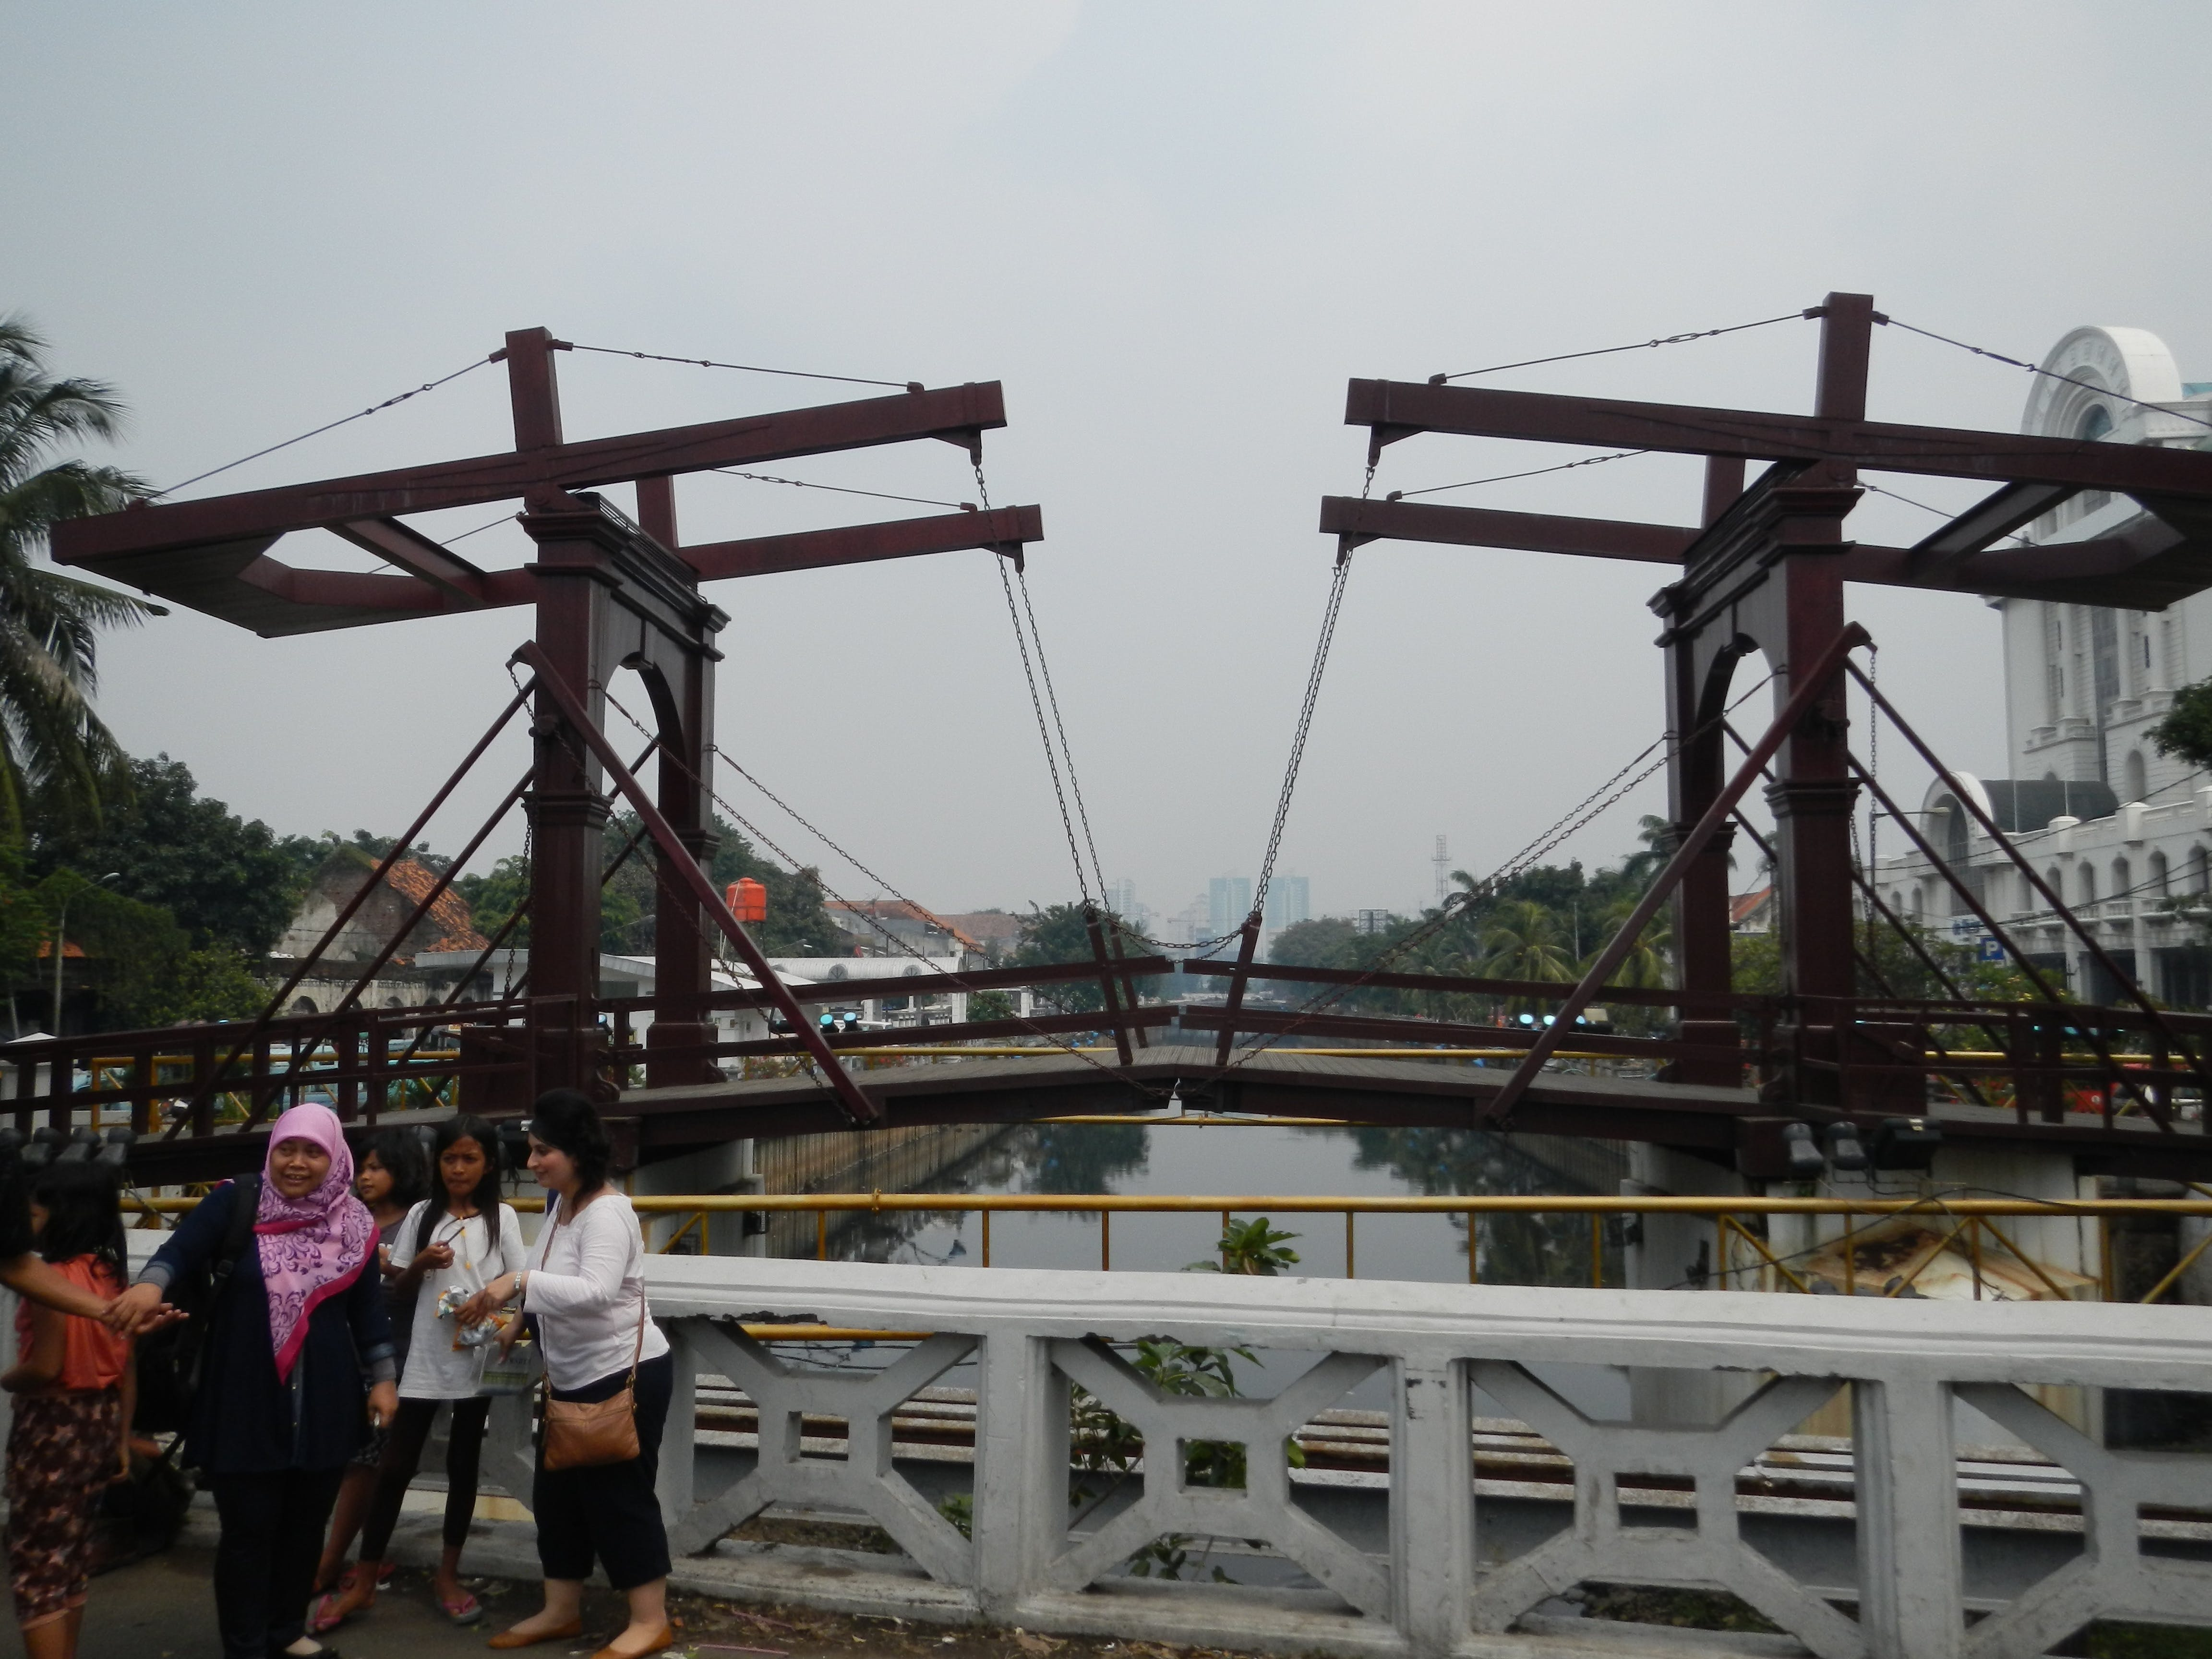 Free stock photo of Jembatan Kota Intan, lift bridge